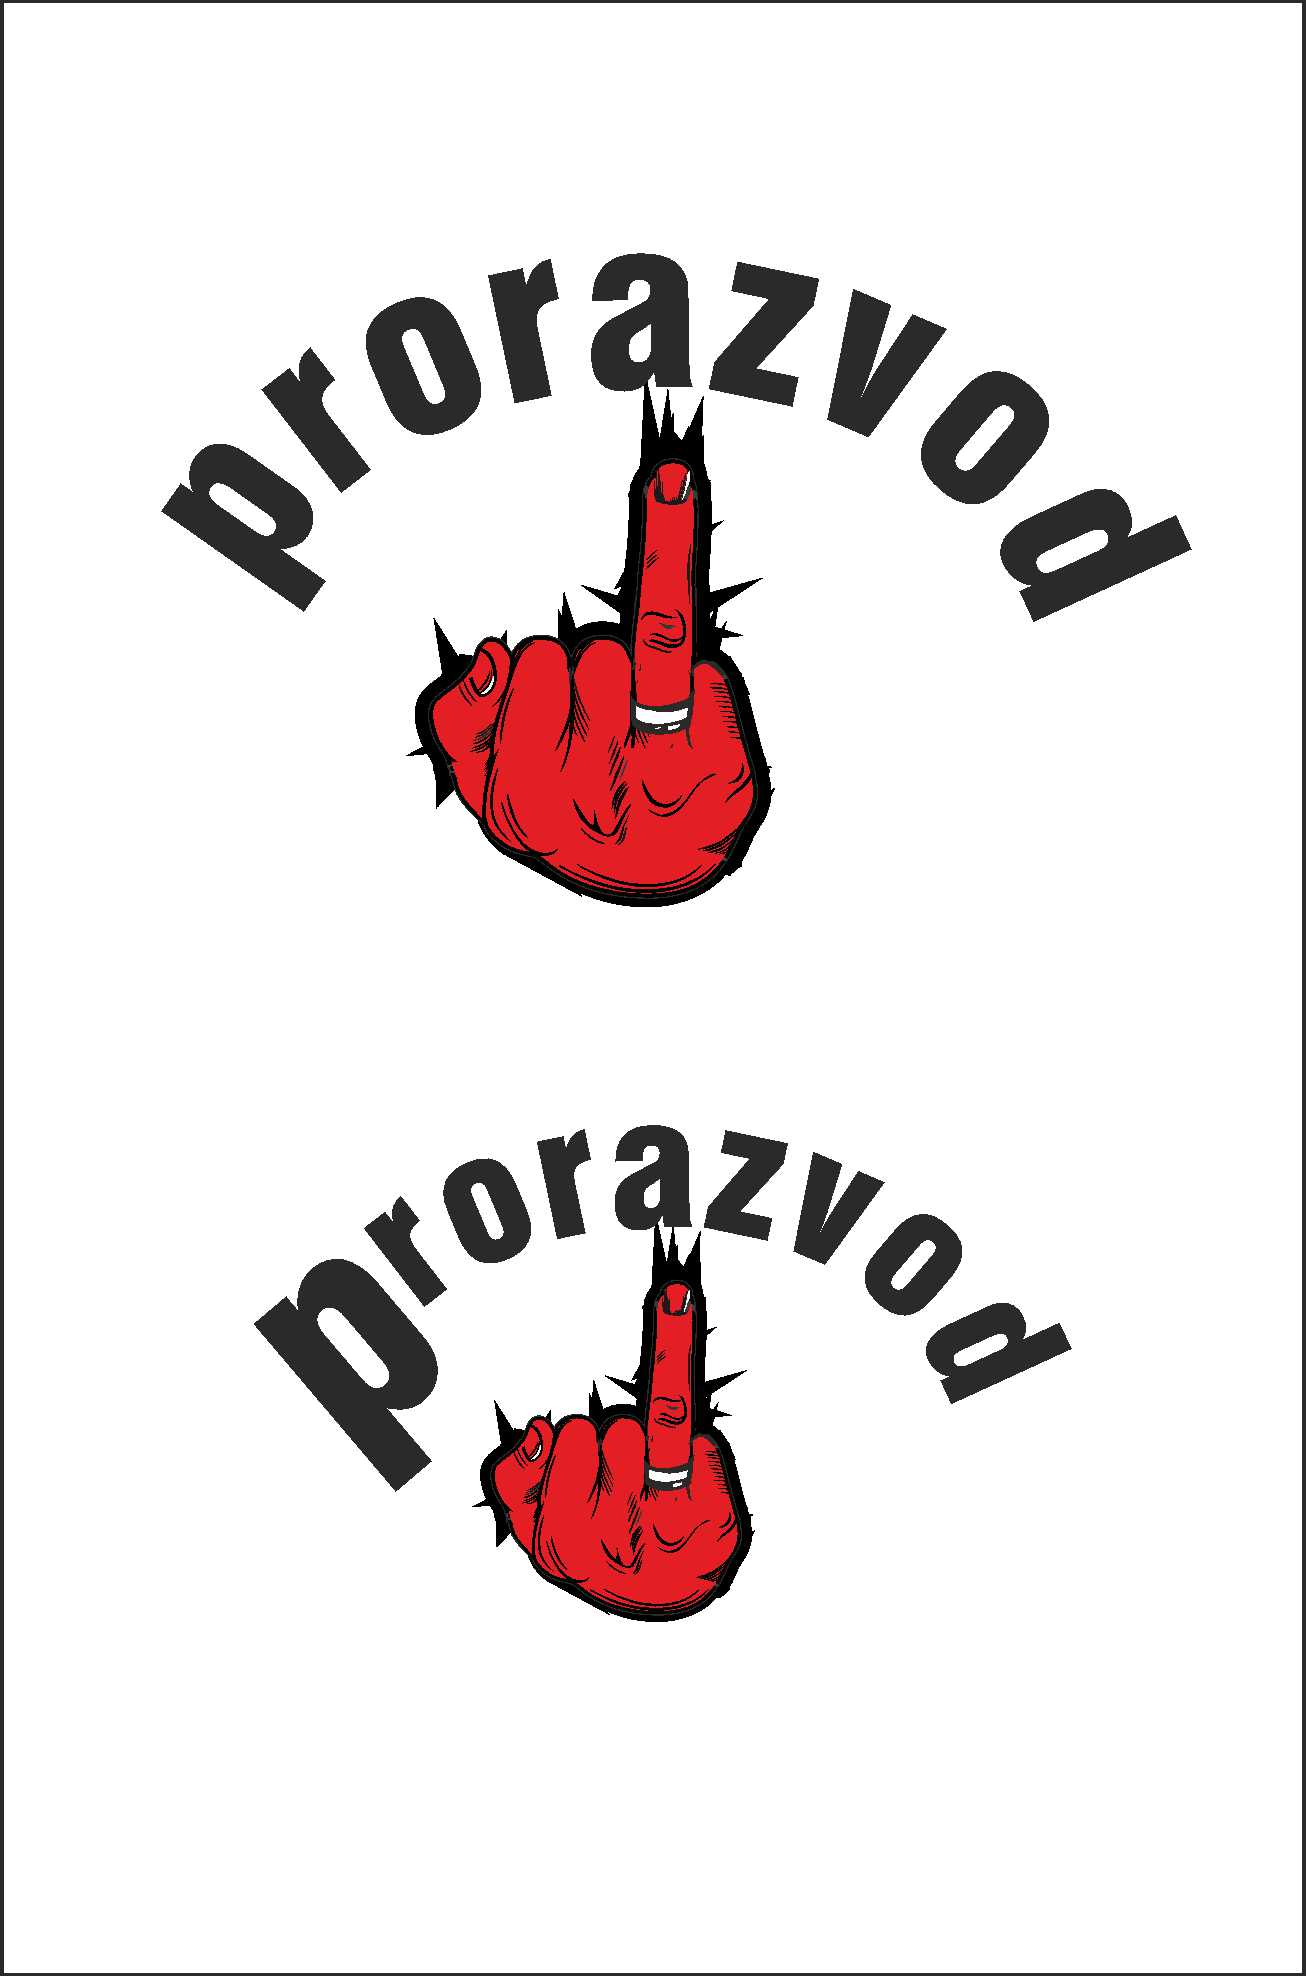 Логотип и фирм стиль для бракоразводного агенства. фото f_7555879182f44070.jpg